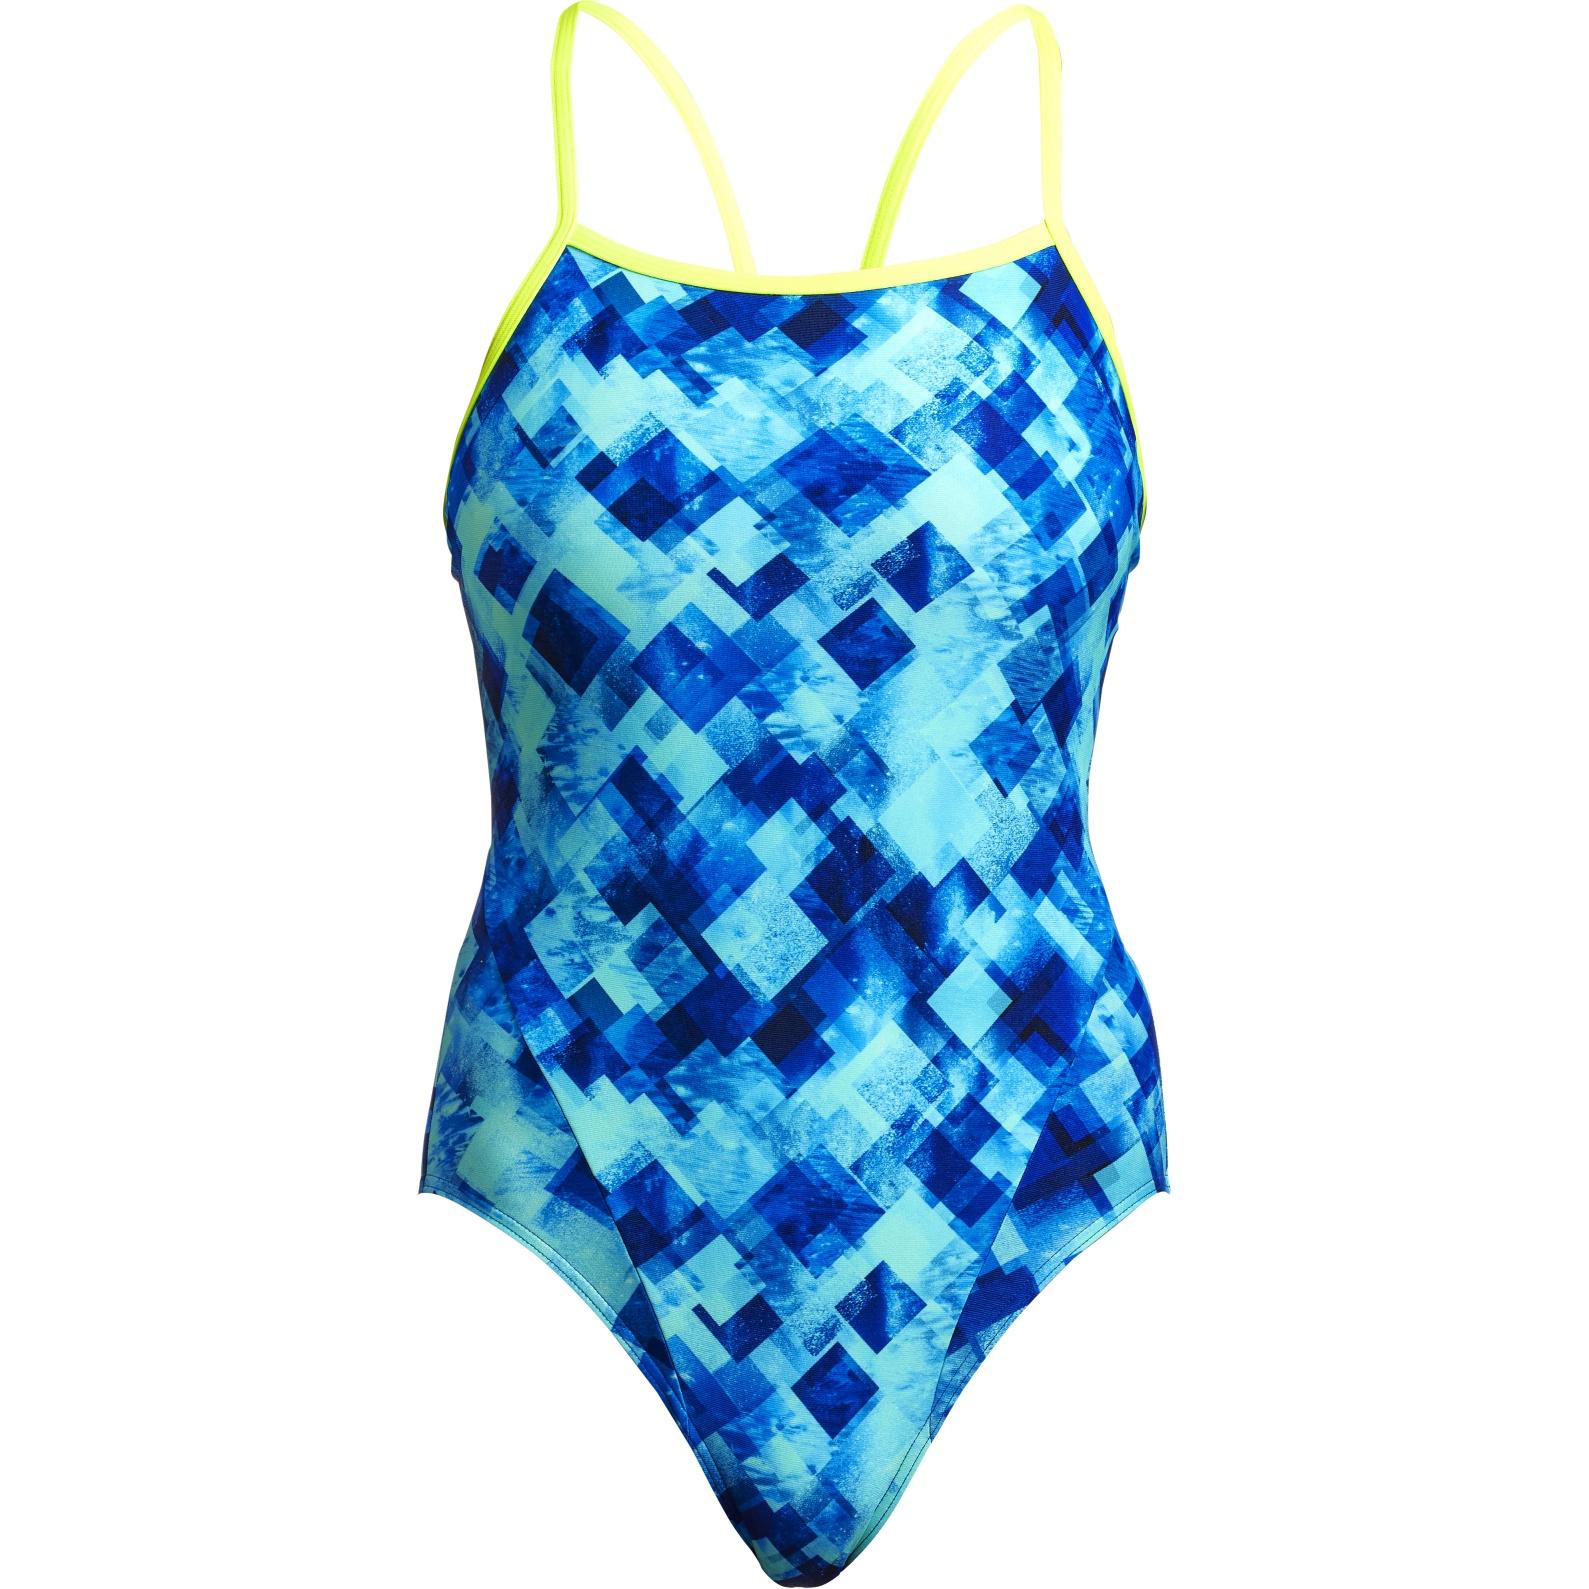 Funkita Ladies Single Strap One Piece Swimsuit - Depth Charge